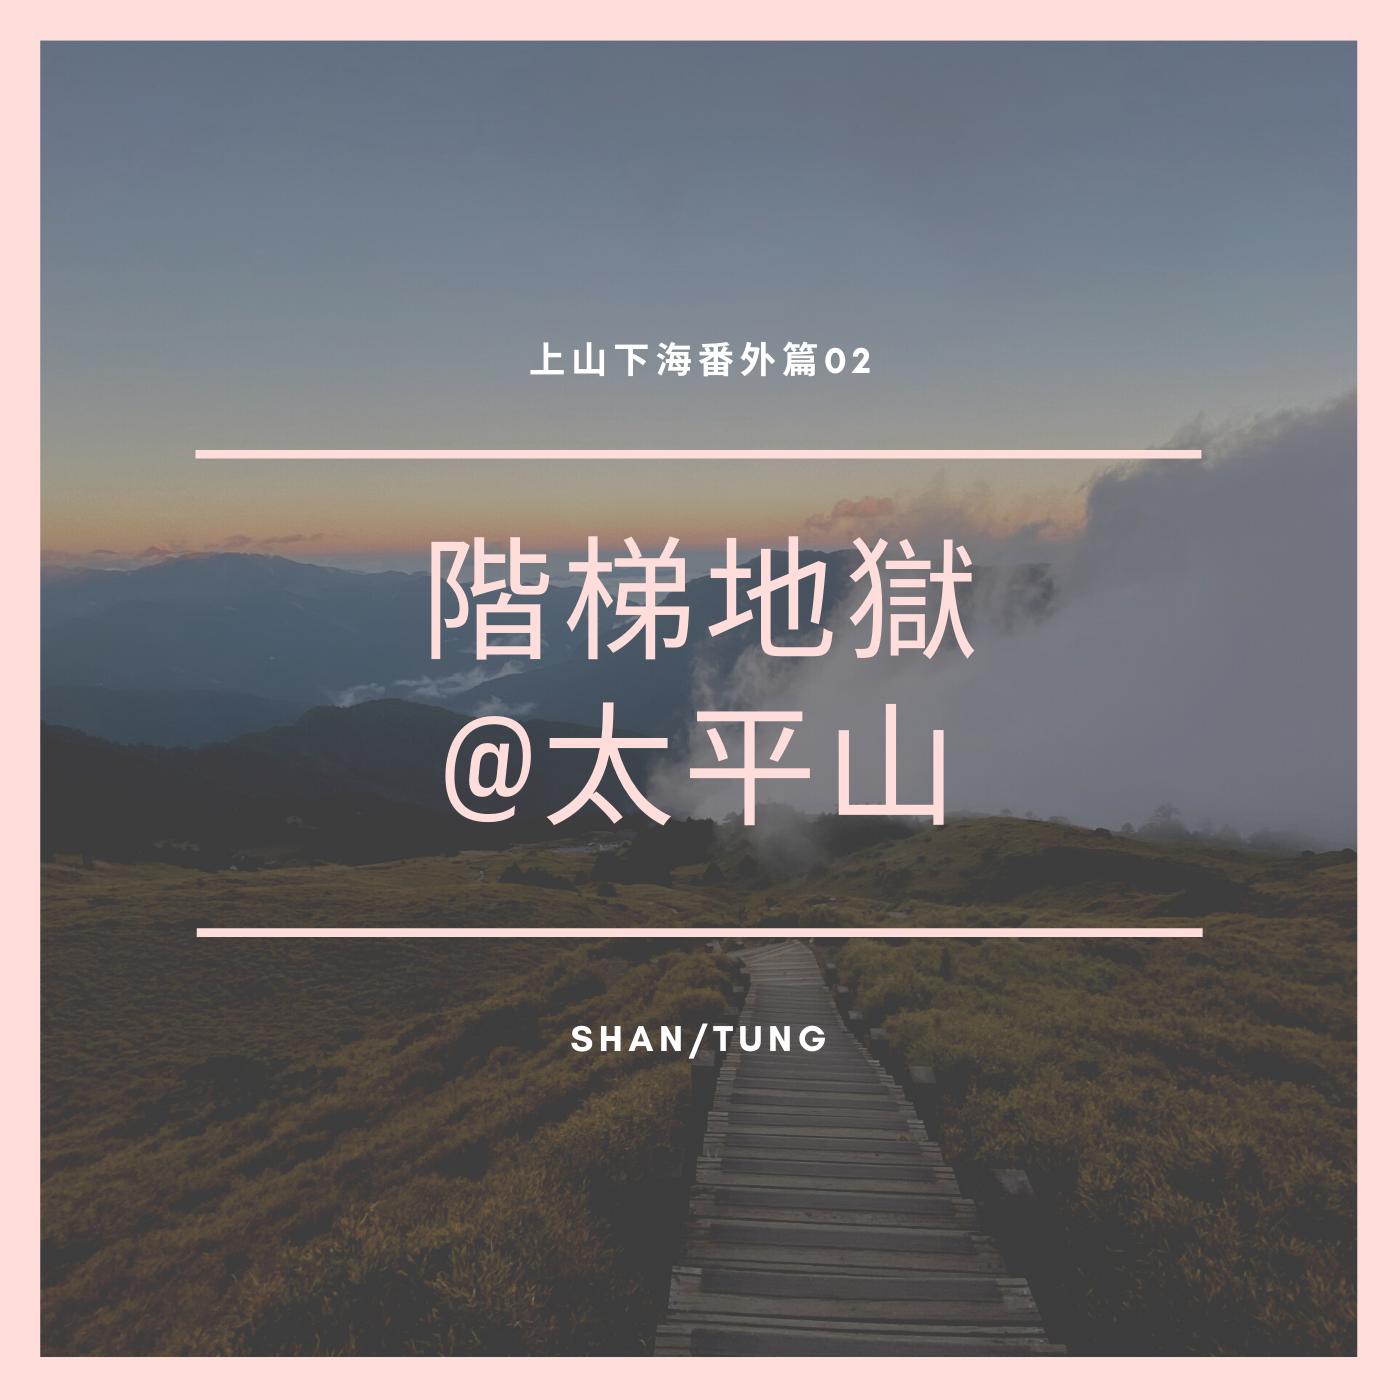 EP23上山下海番外篇02:階梯地獄@太平山